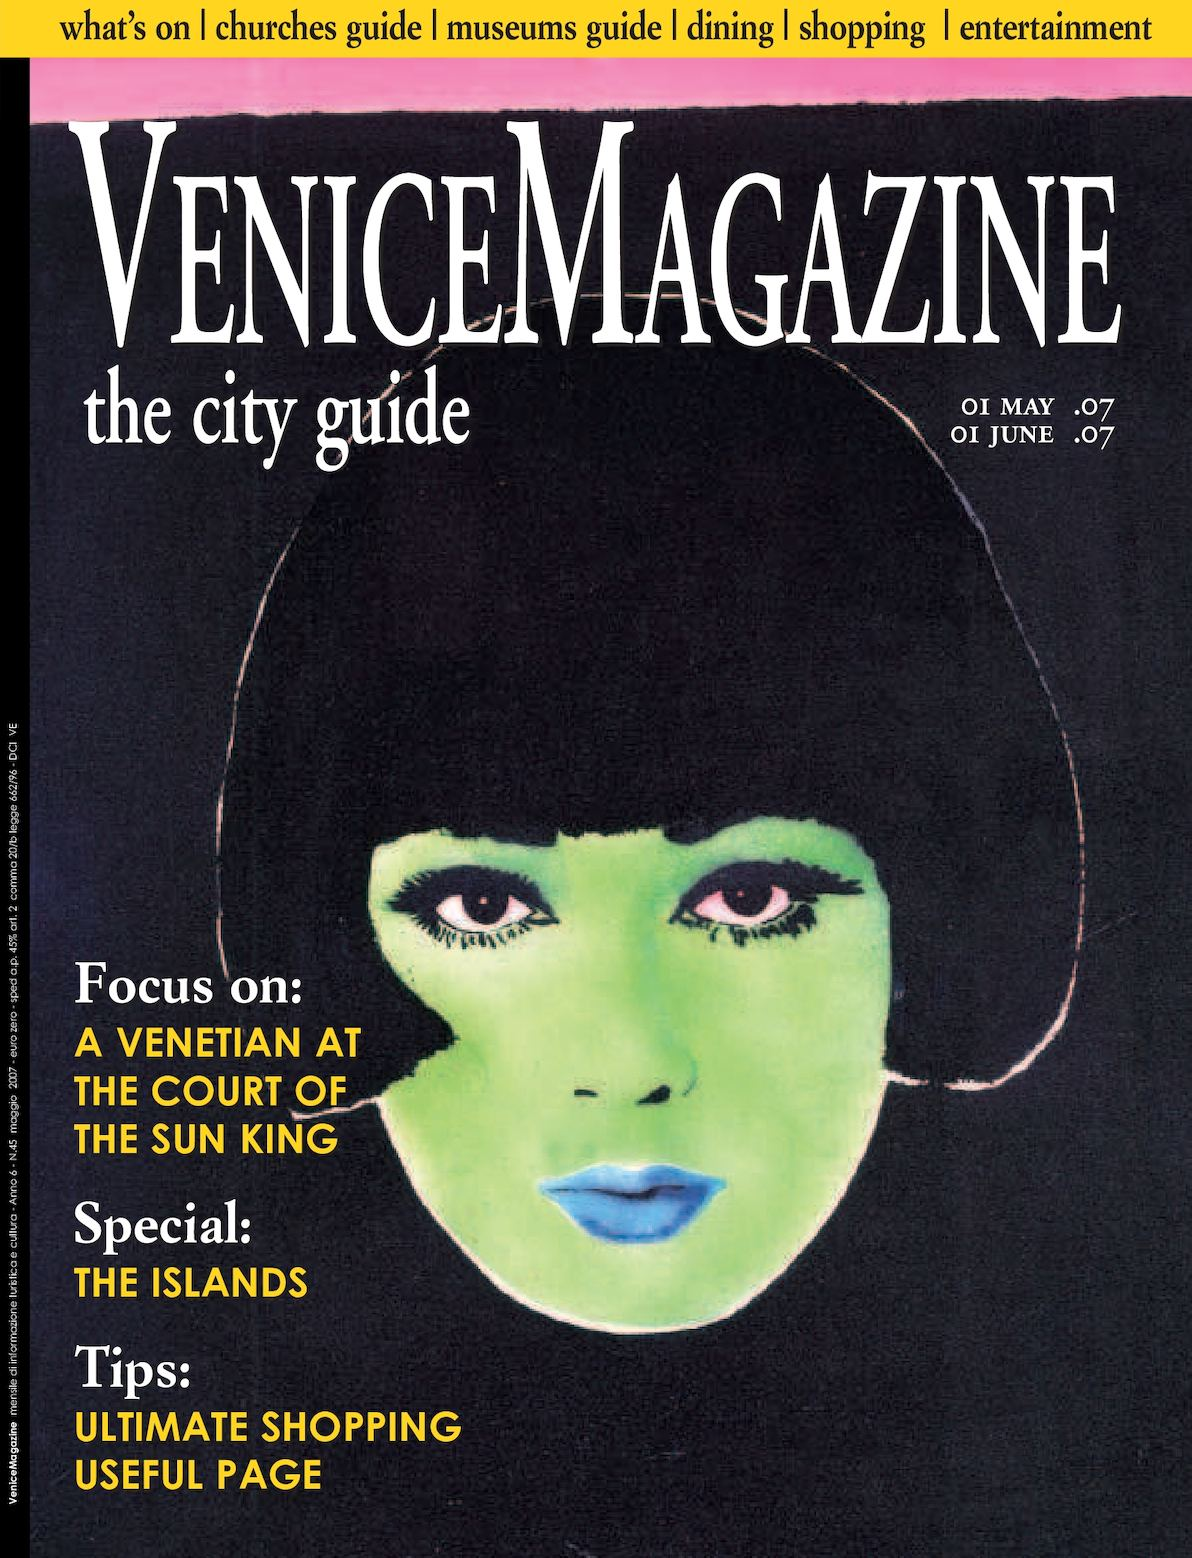 Calaméo - Venice Magazine 45